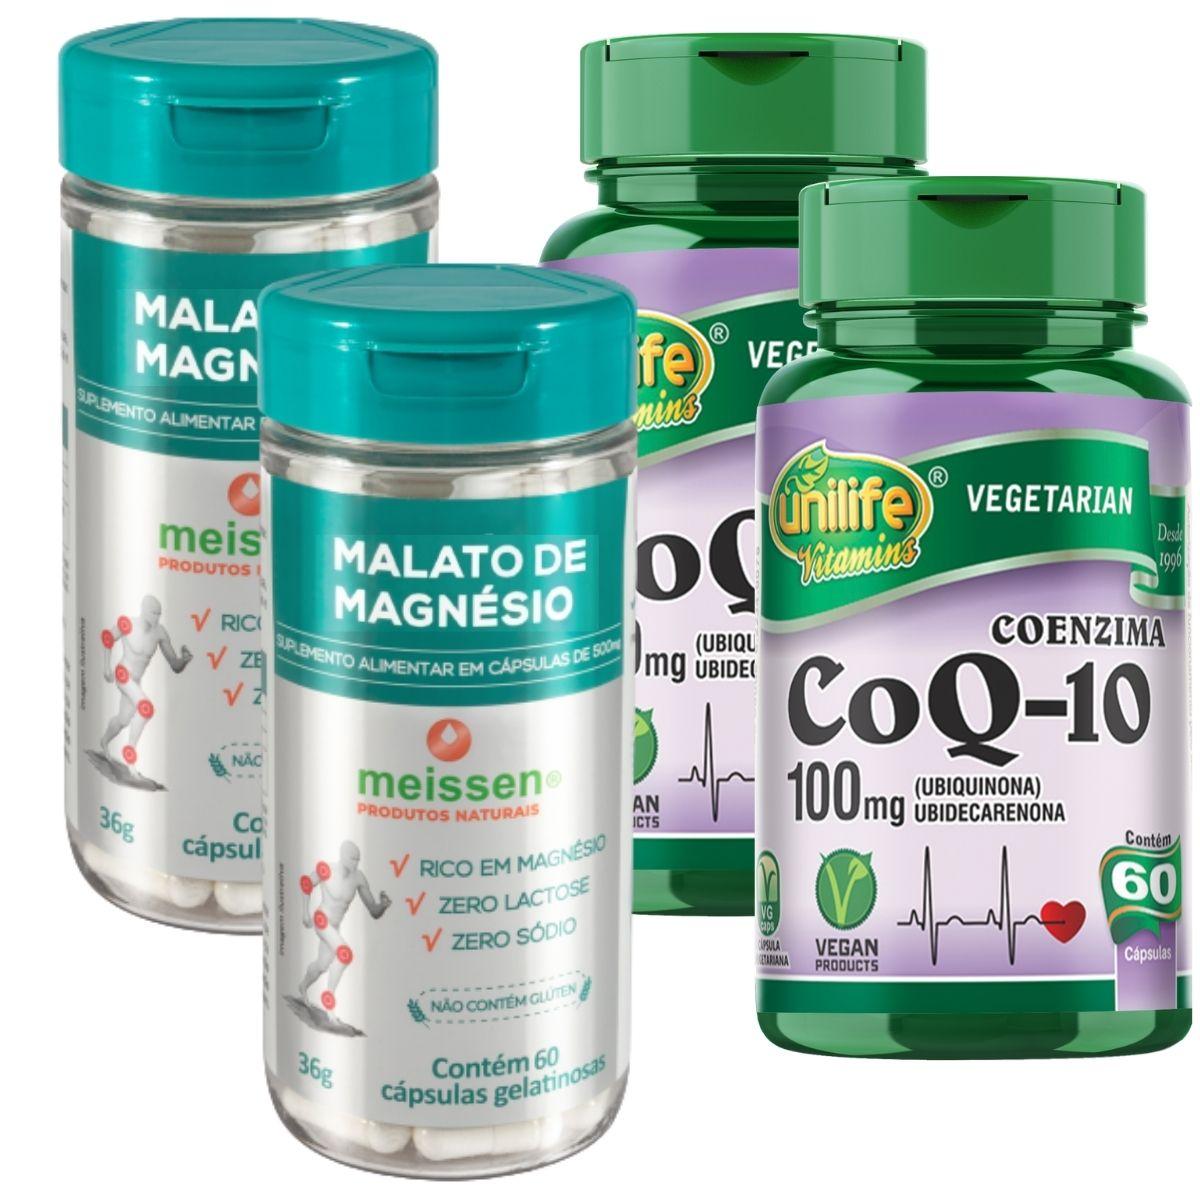 Kit 2 Coenzima Q10 100 Mg 60 Cápsulas + 2 Malato de Magnésio 60 Cápsulas- Meissen